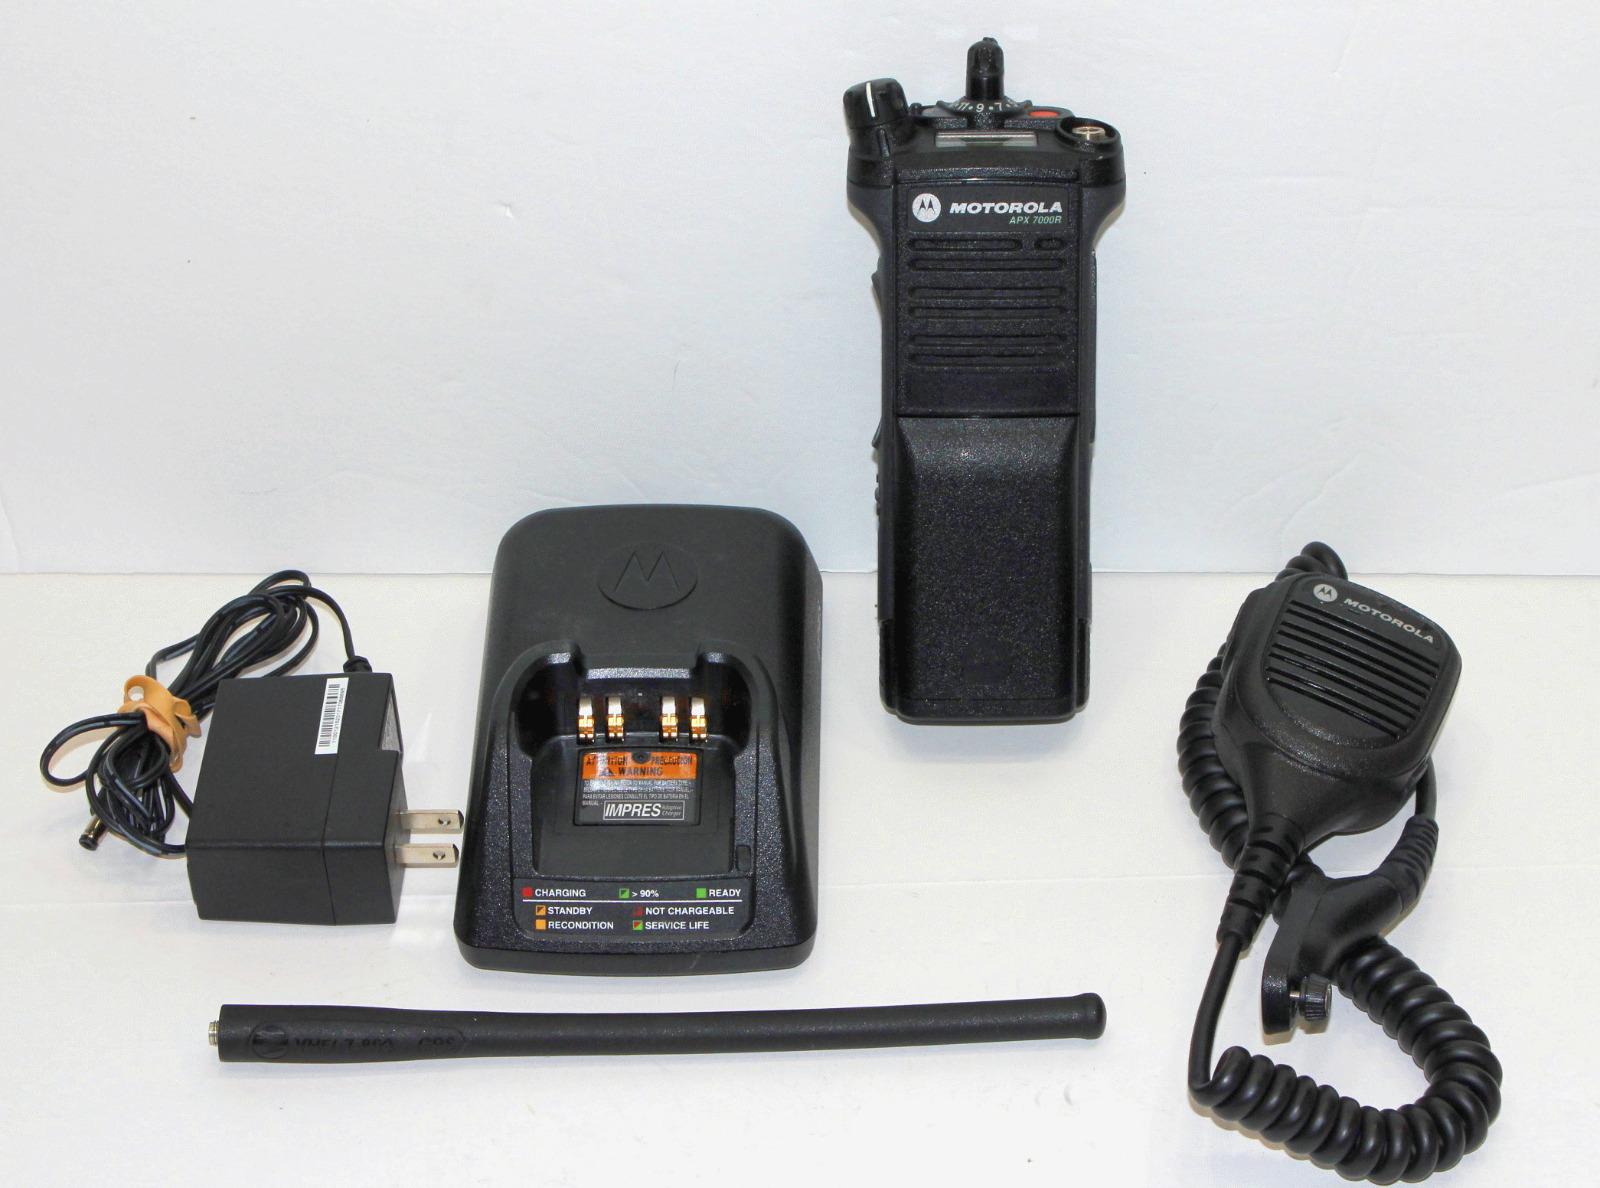 Seller refurbished TESTED MOTOROLA APX7000 APX 700/800 UHF 450-520 MHZ DIGITAL RADIO P25 TDMA AES .